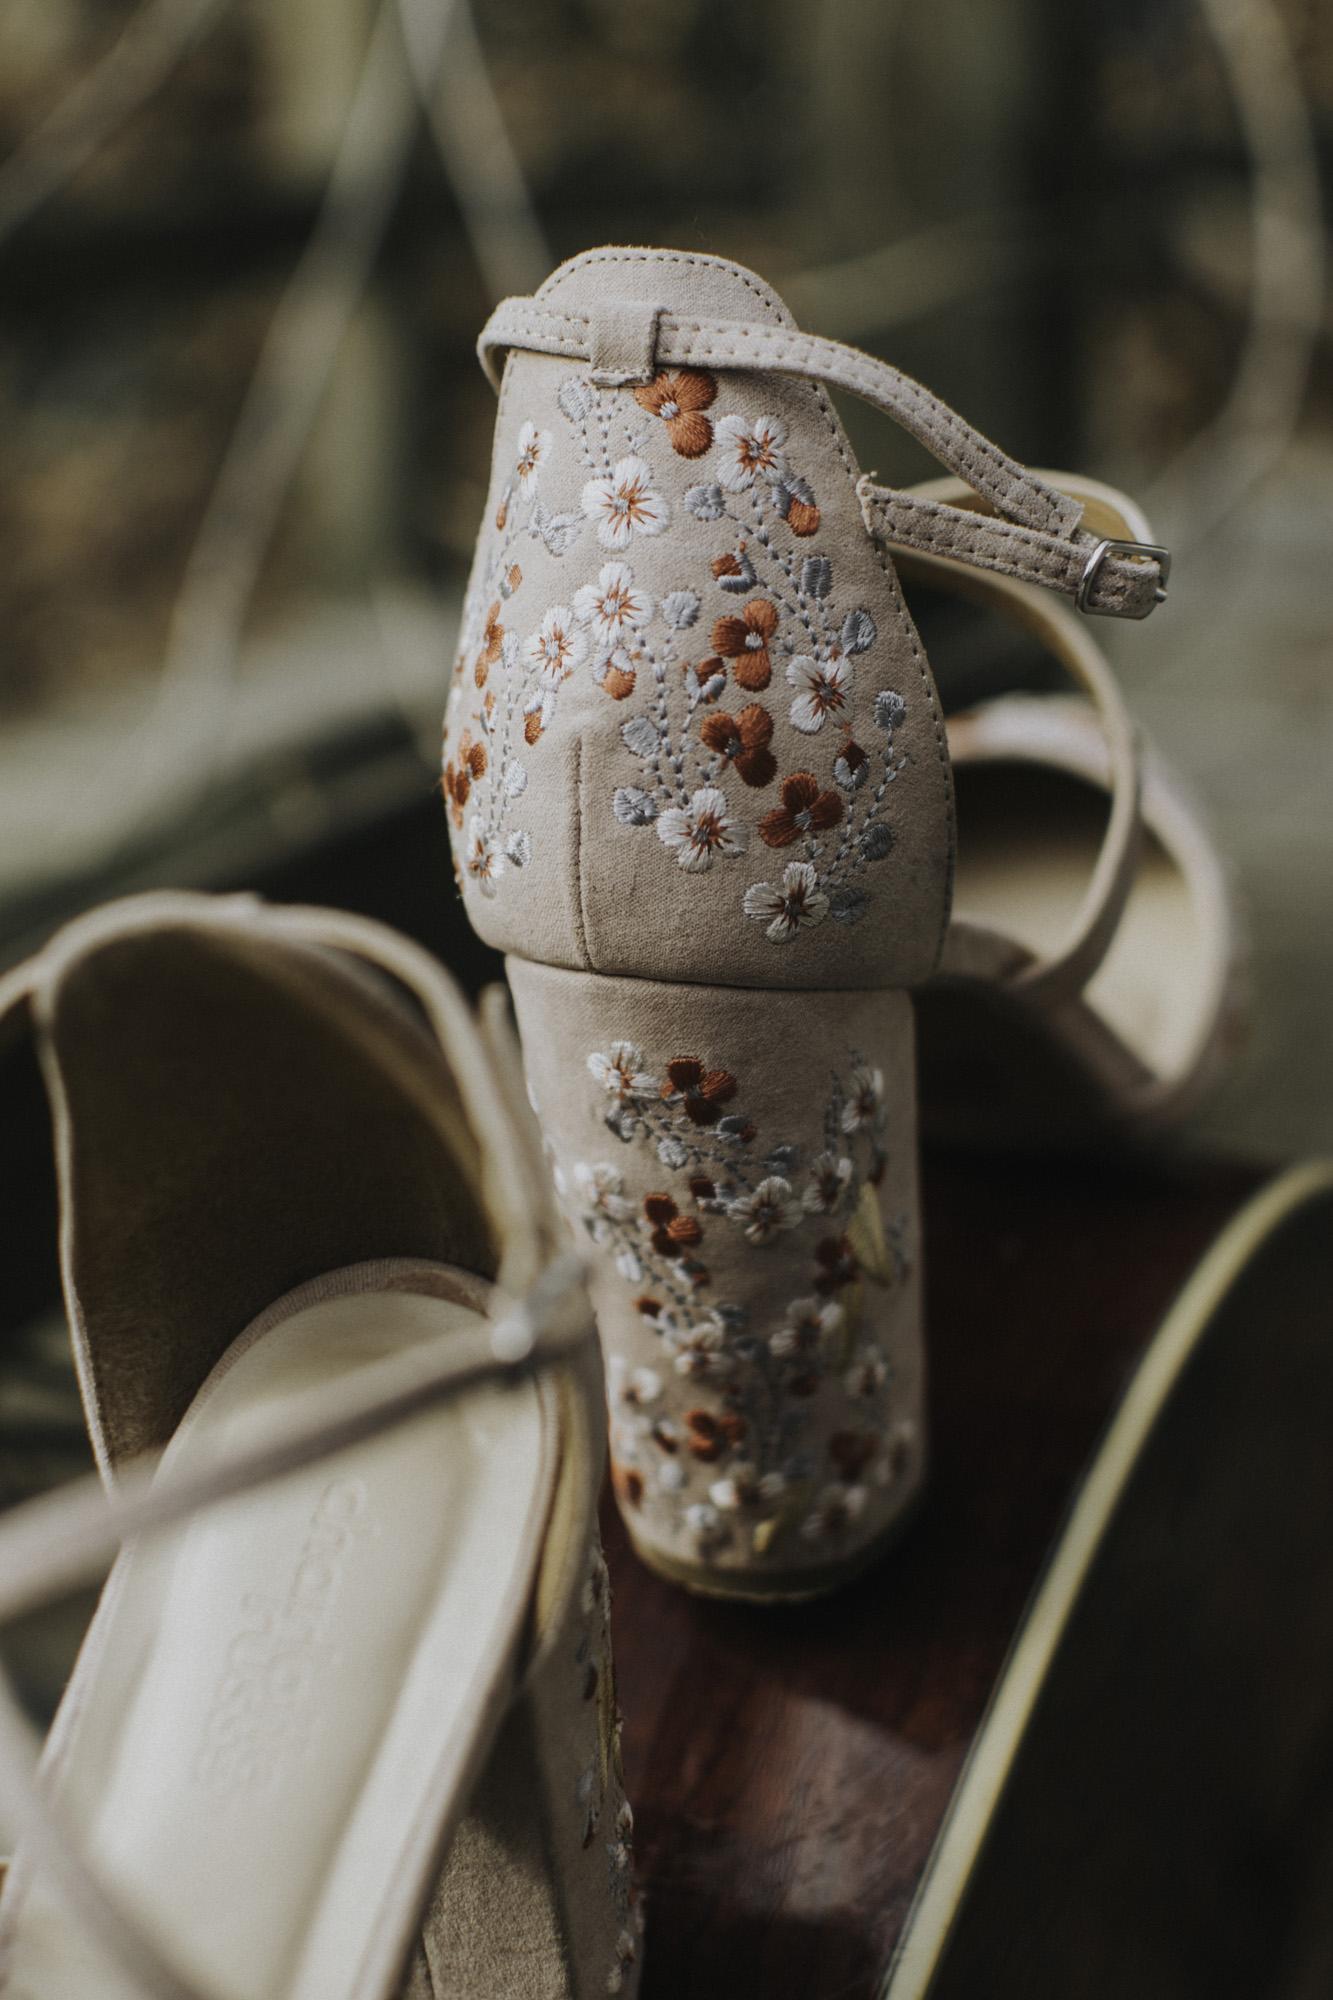 Cate_Ann_Photography_Dayton_Ohio_Wedding_Elopement_And_Engagement_PhotographerDSC_5652.jpg